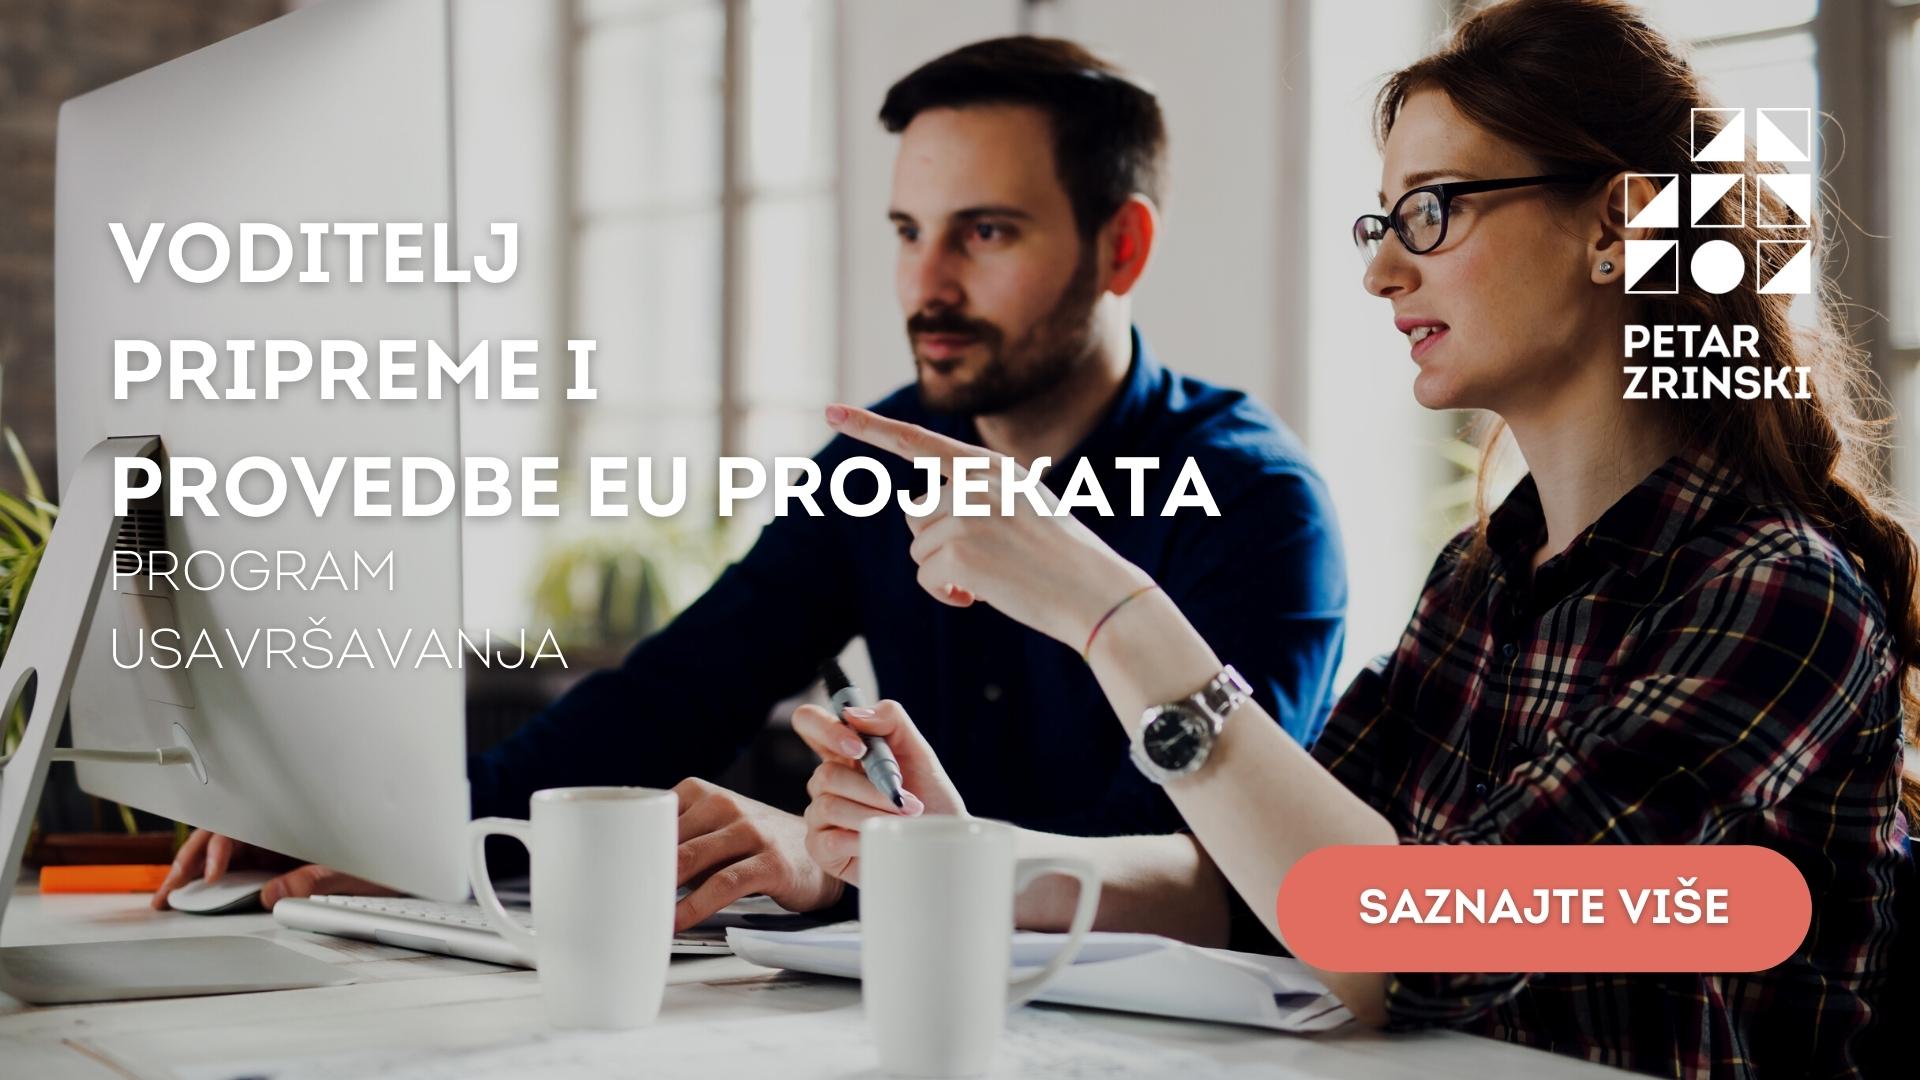 Voditelj EU projekata